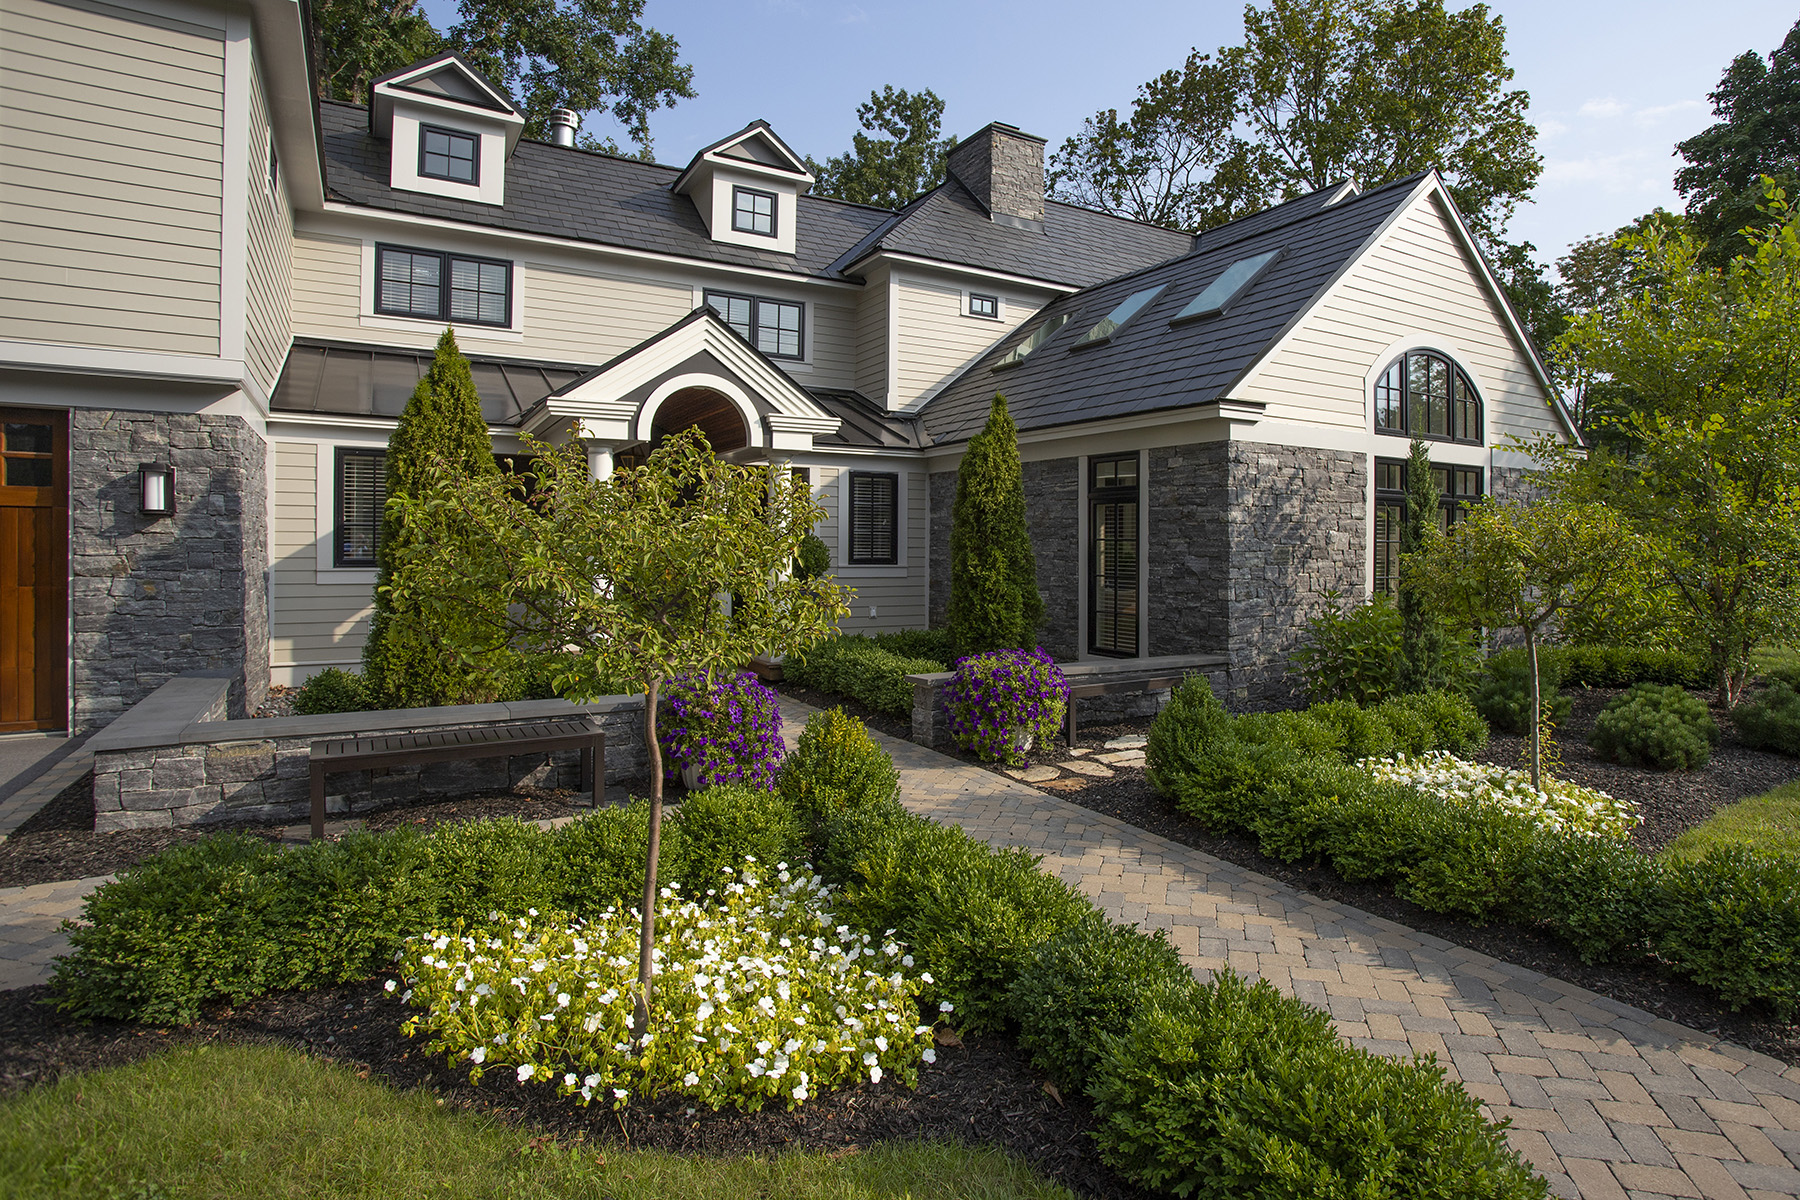 stone home entrance